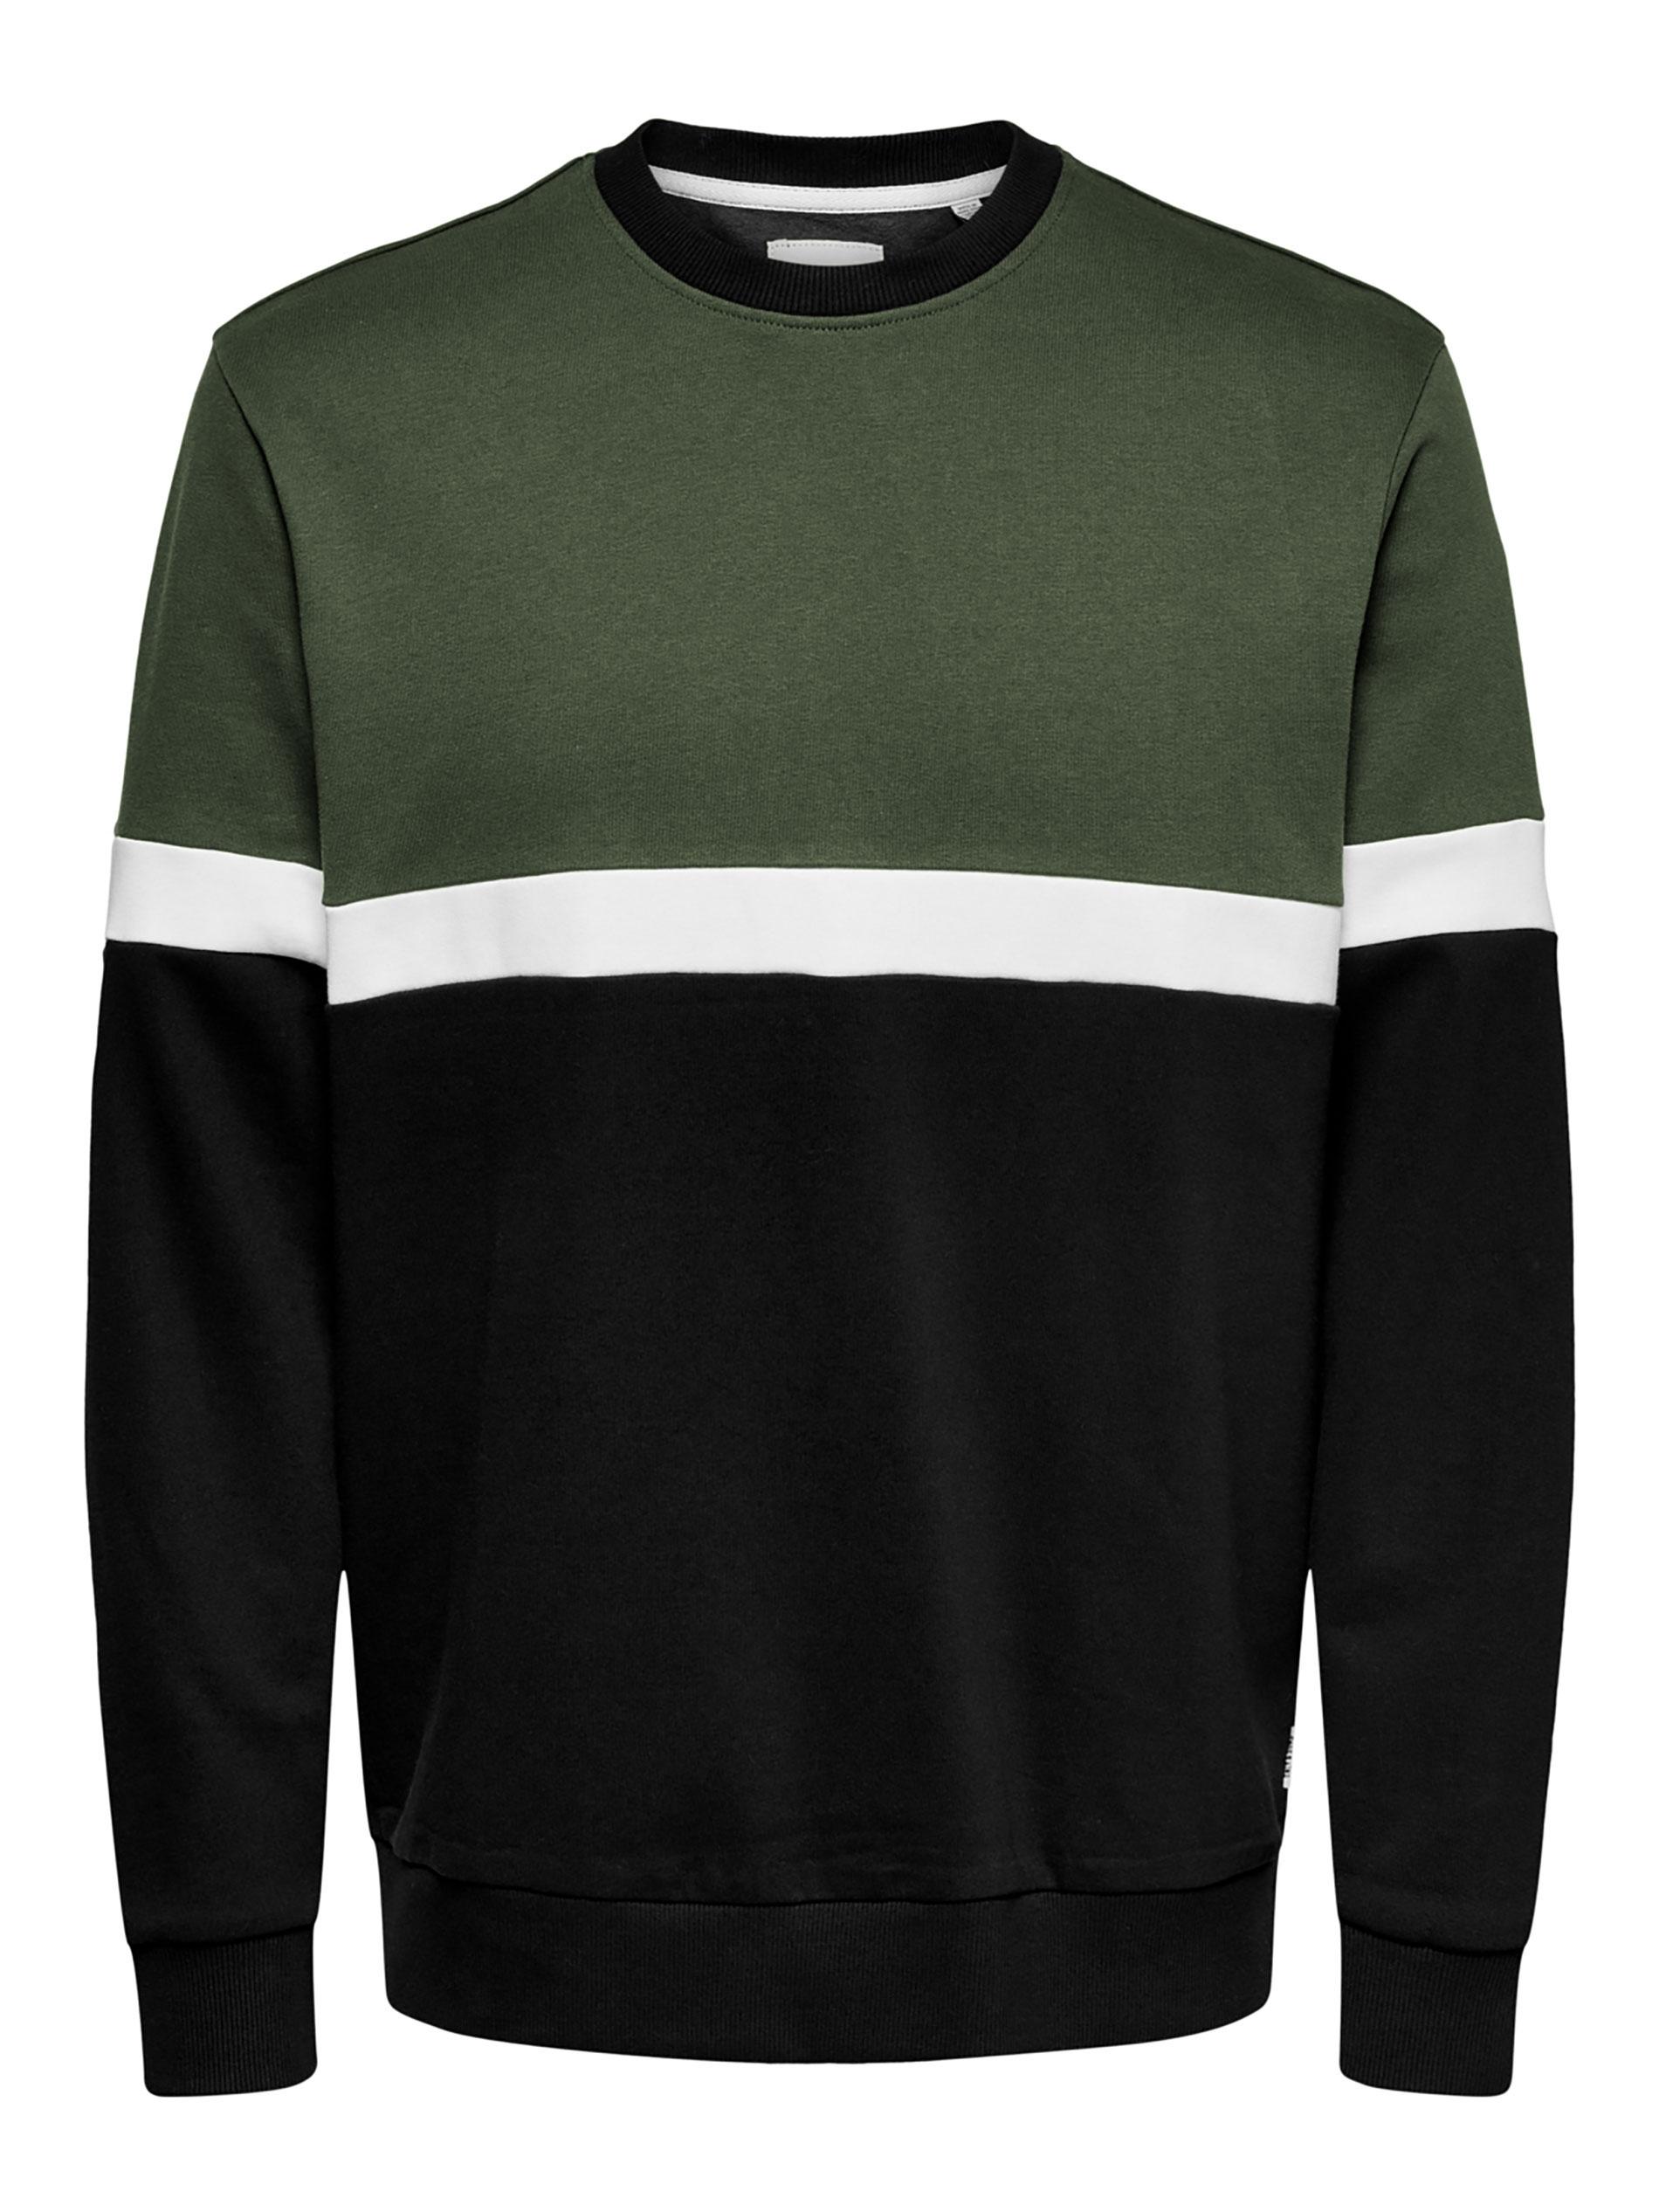 ONLY & SONS Khaki Colour Block Crew Neck Sweatshirt